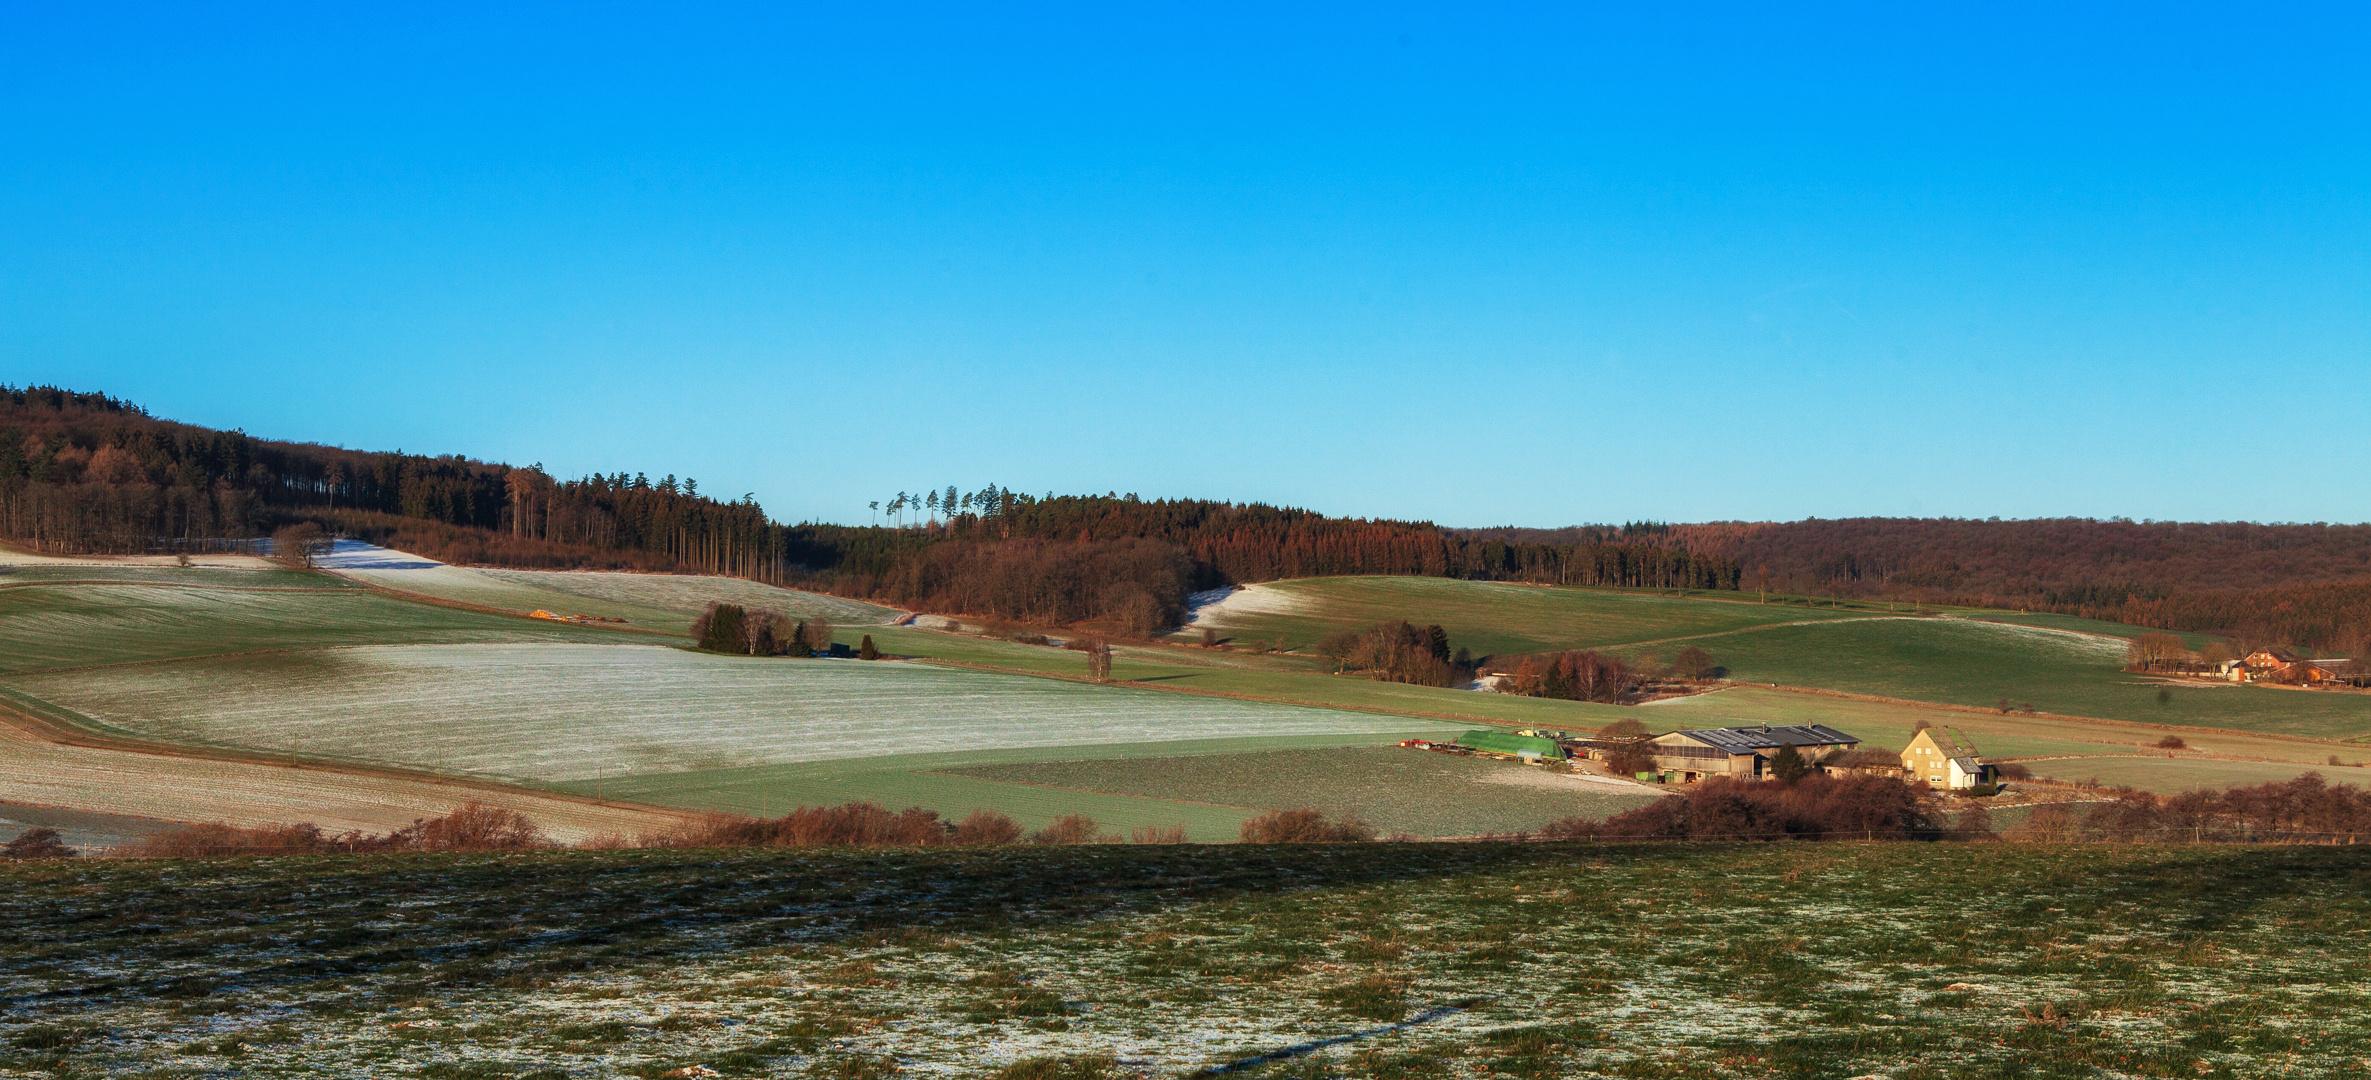 Arnsberger Wald im Januar 2019